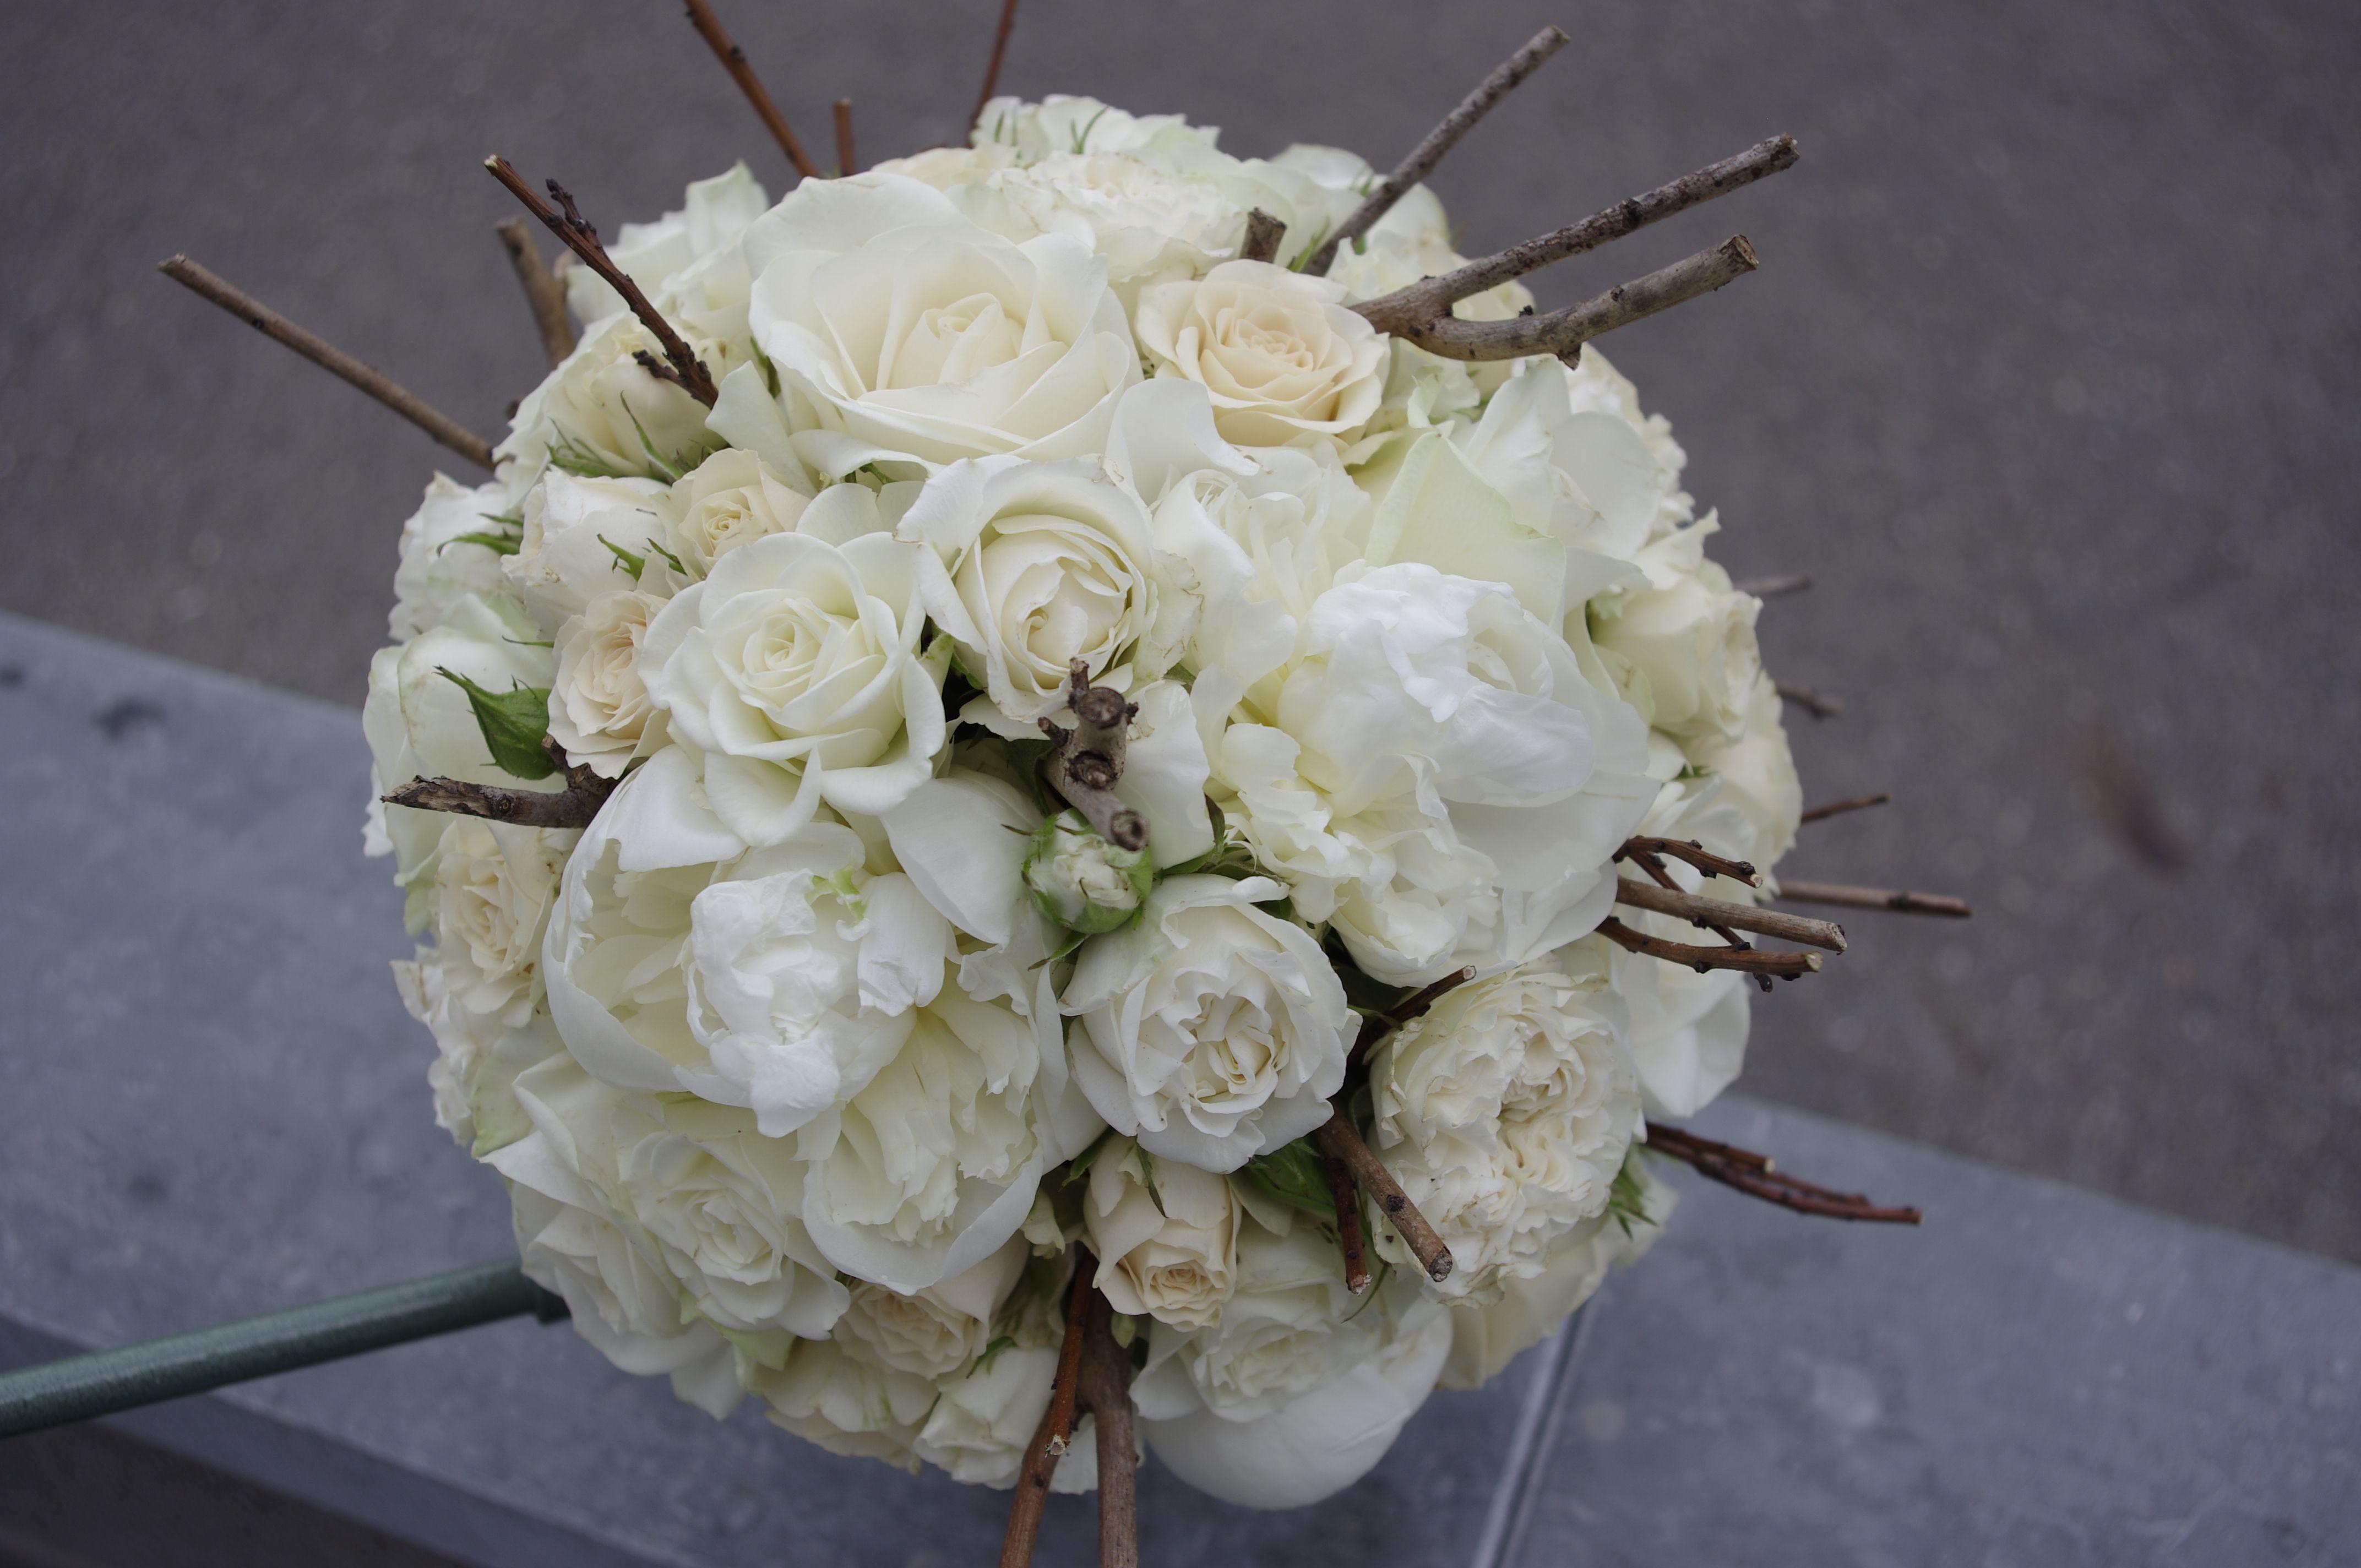 bouquet blanc pivoine rose mariée wedding branches